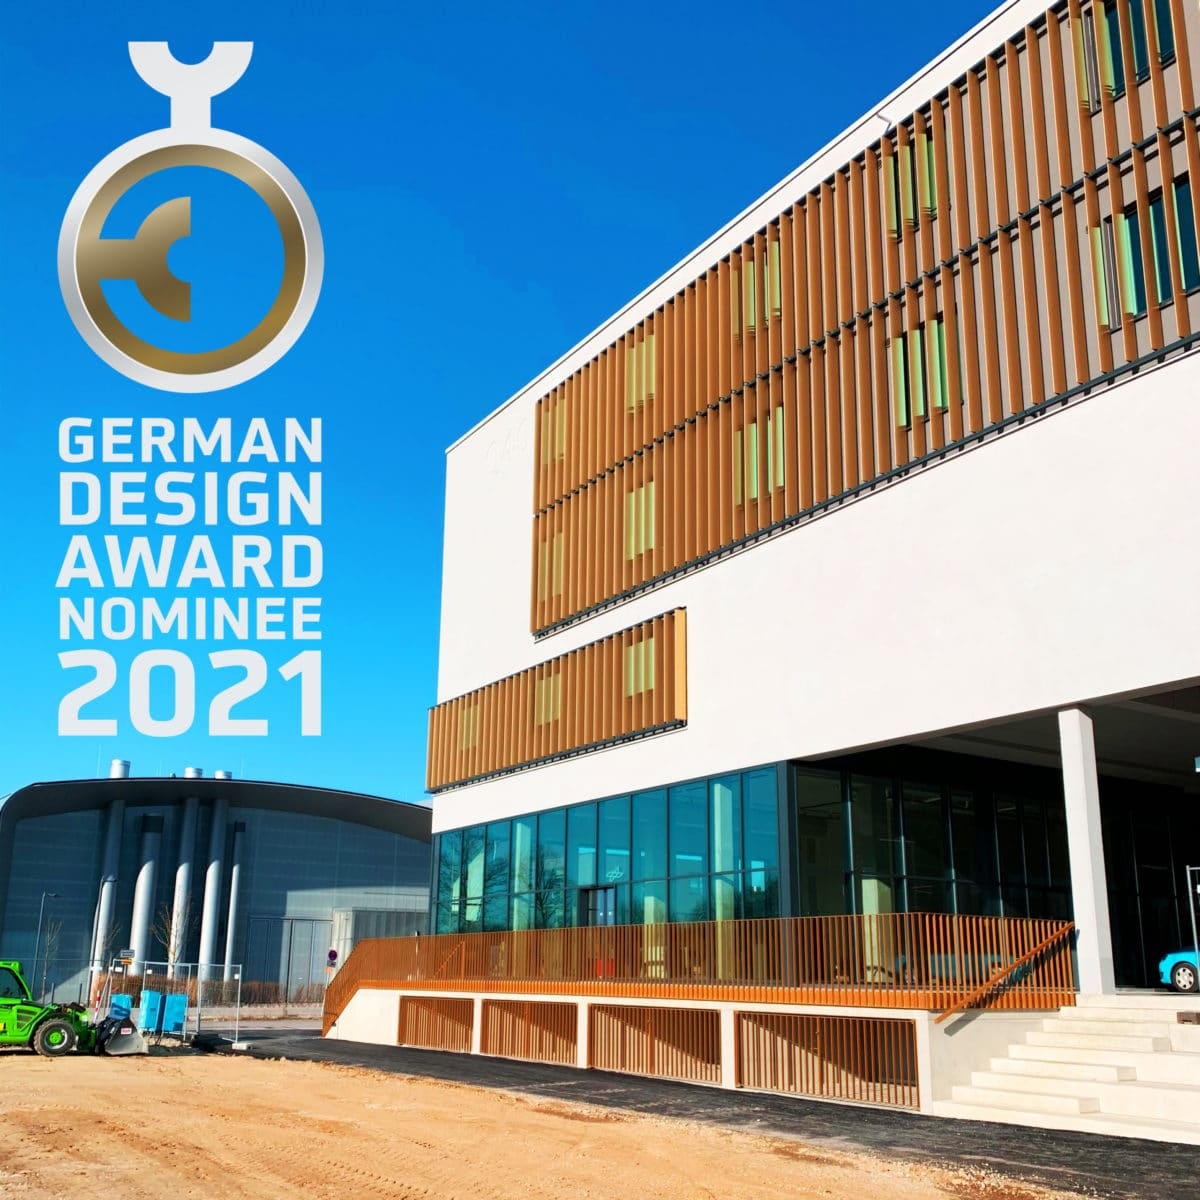 Q40 German Design Award